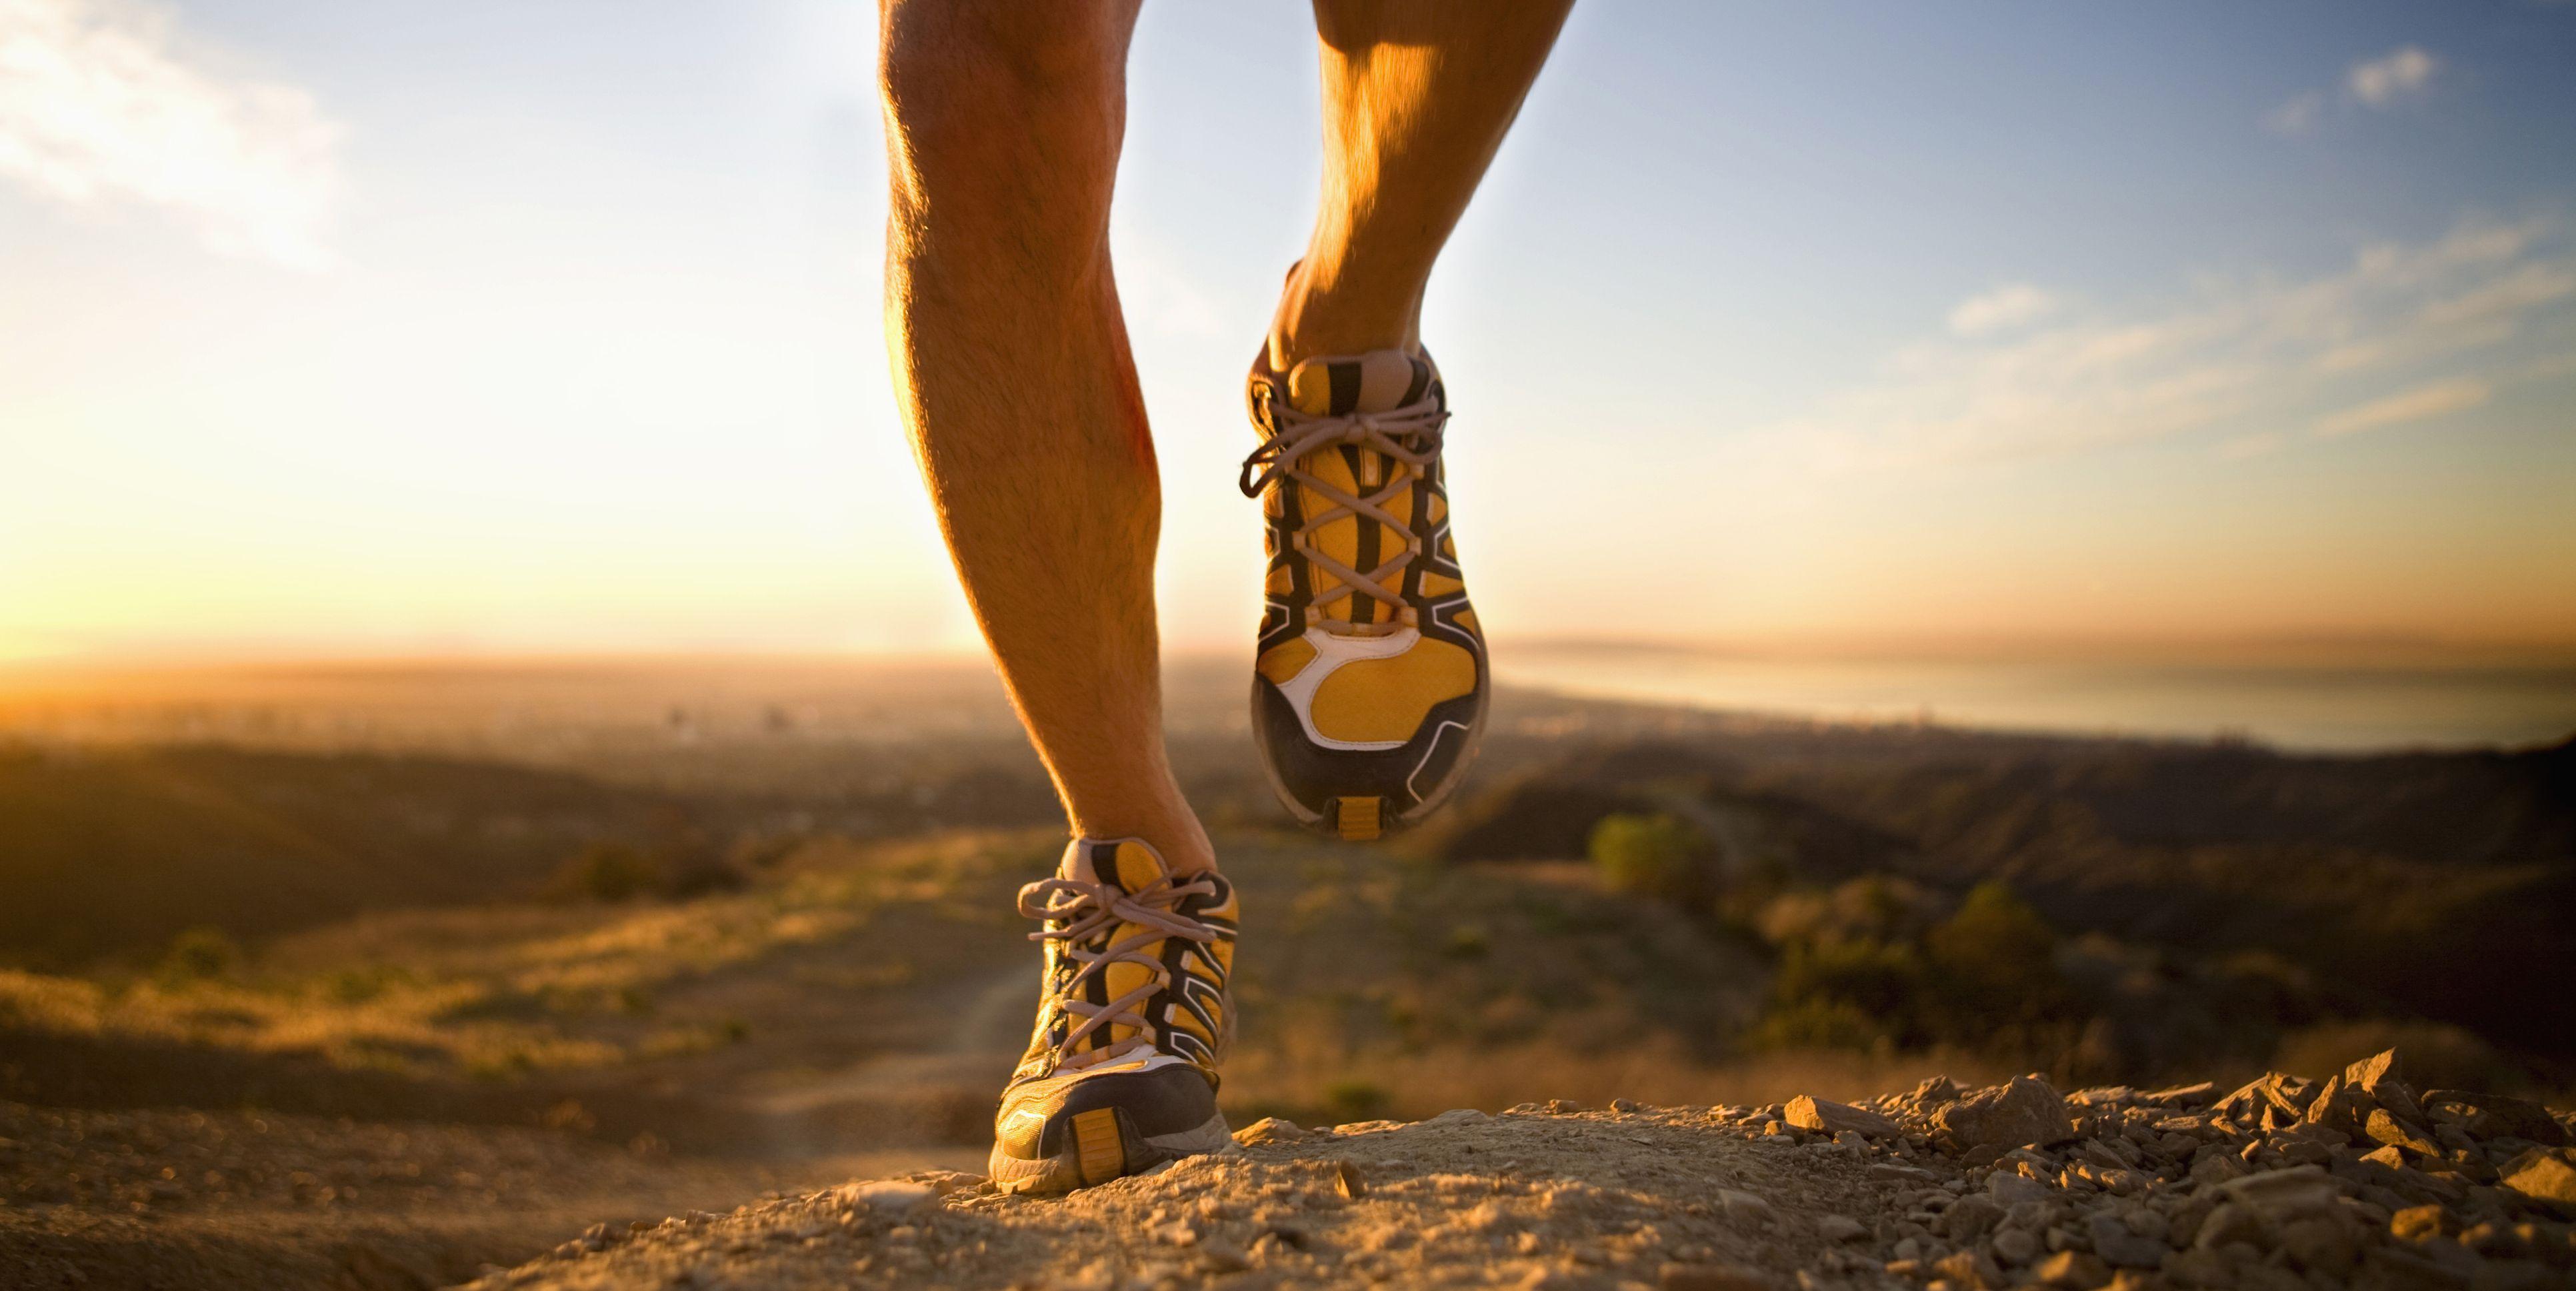 Legs running toward the camera